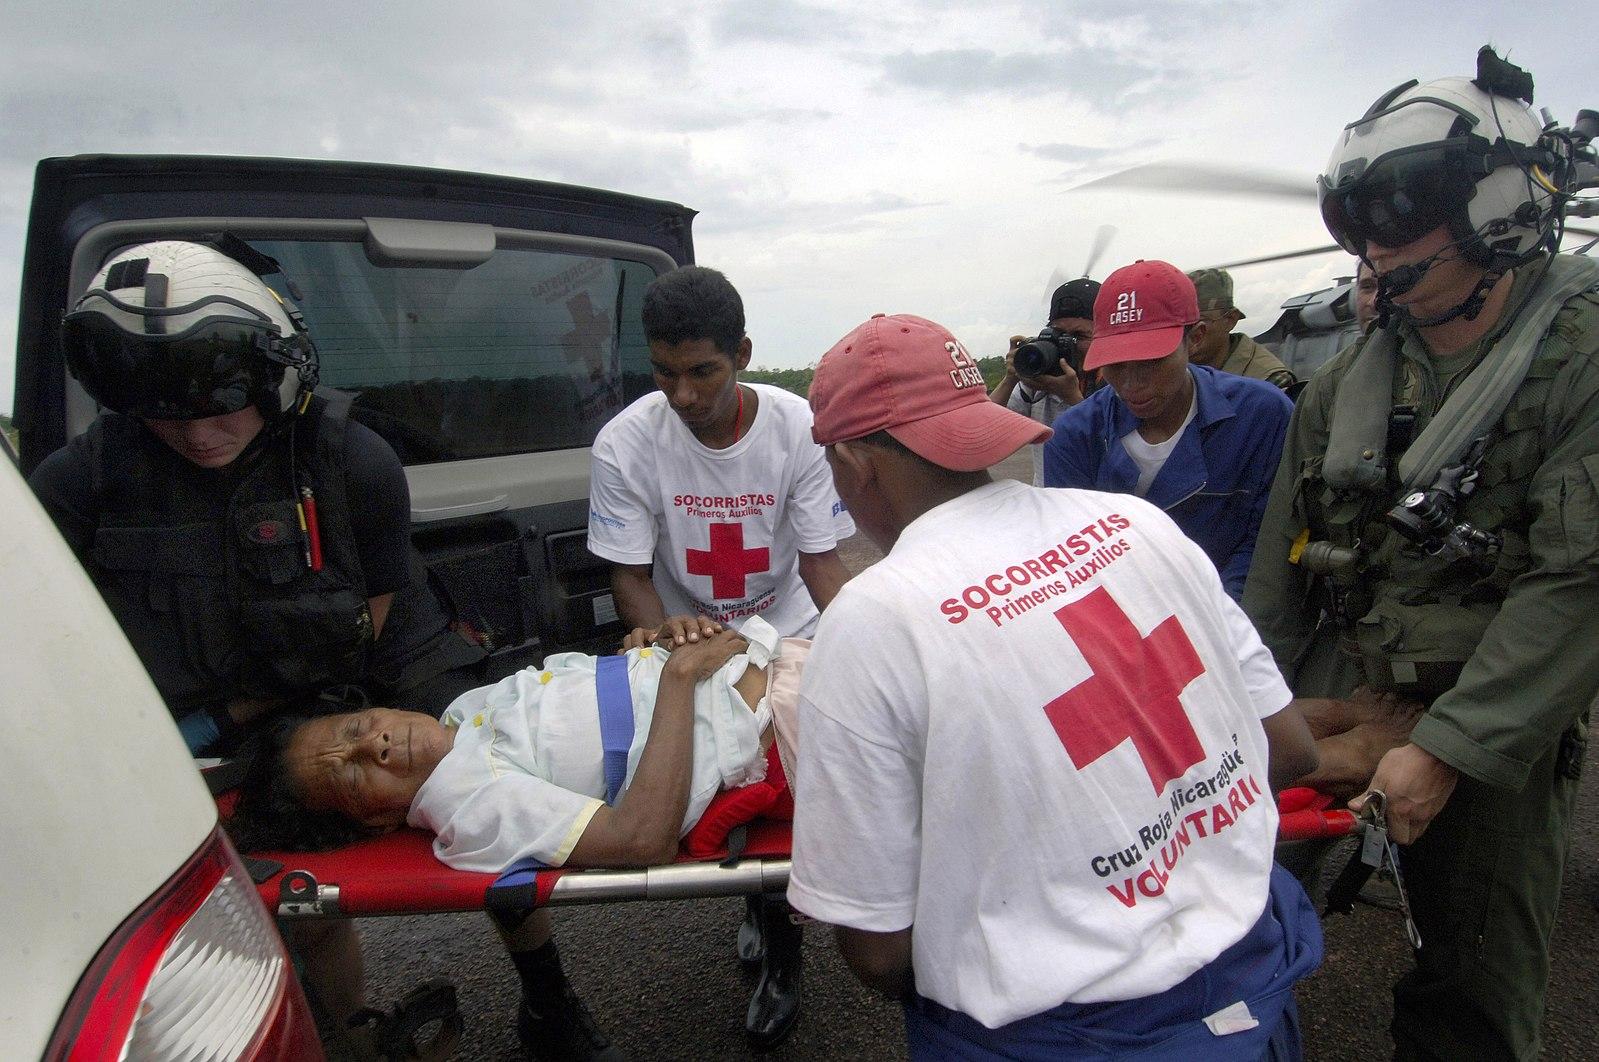 ed Cross Disaster Relief Volunteers